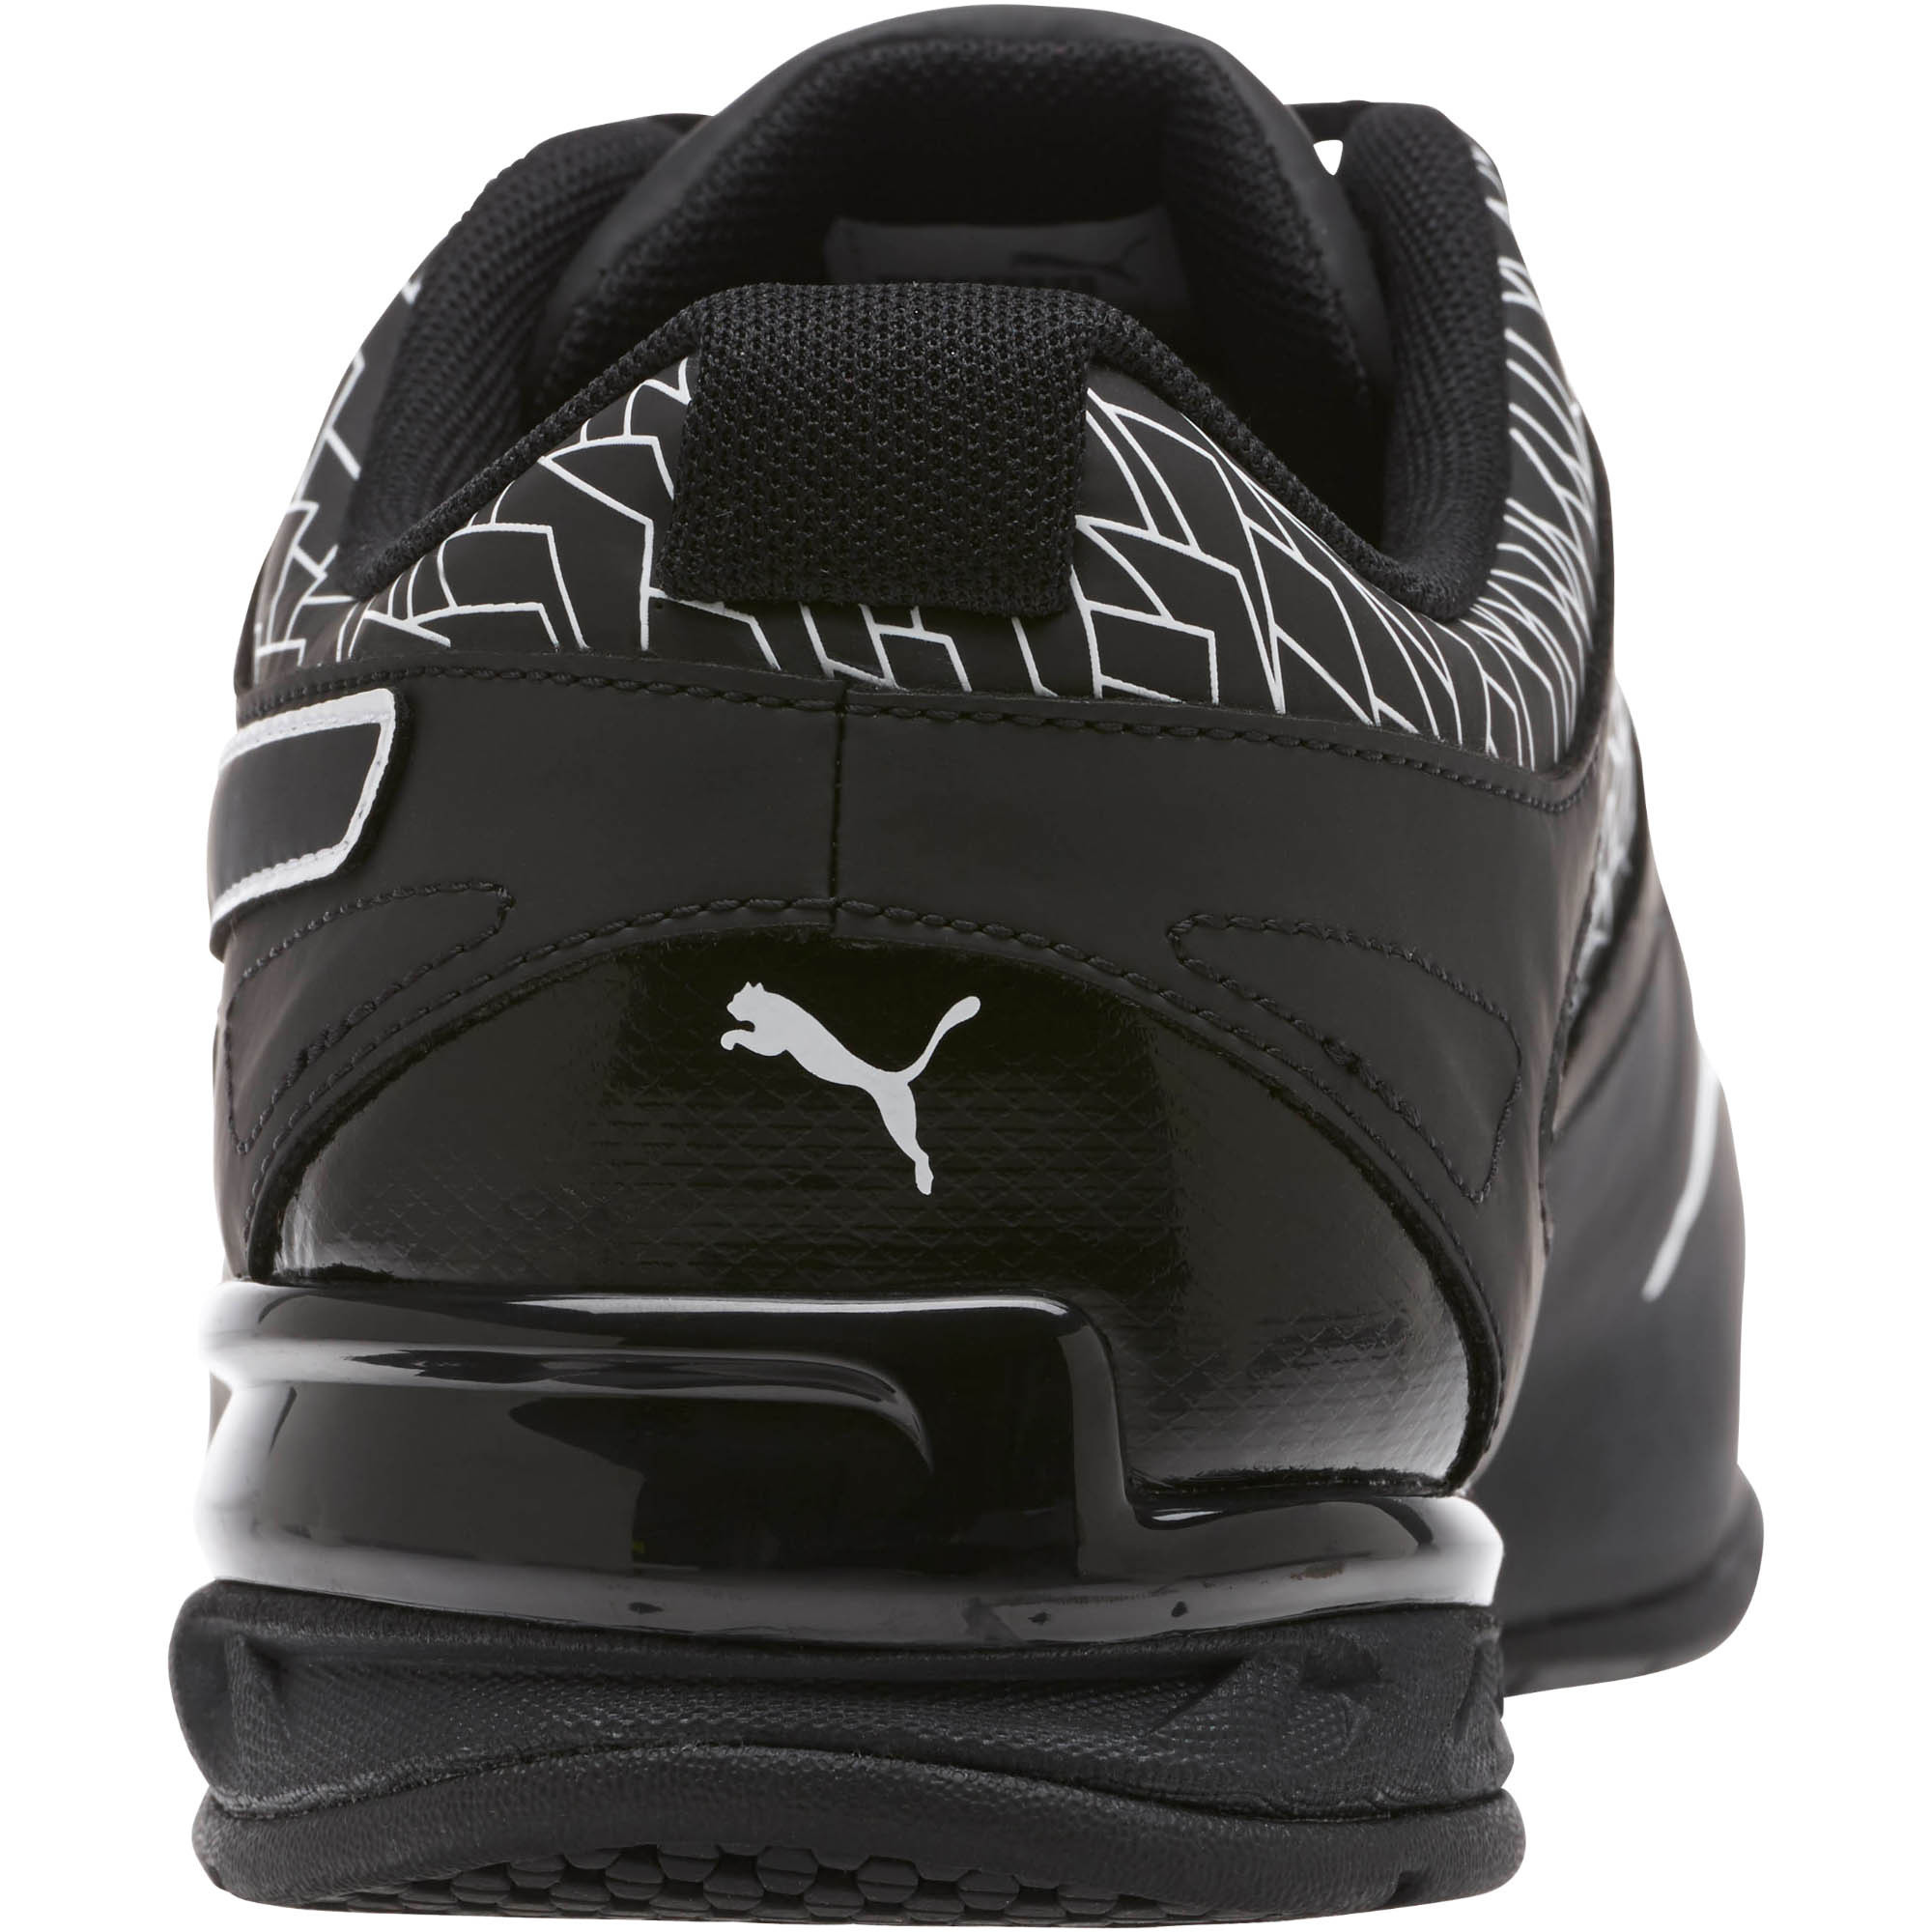 PUMA-Men-039-s-Tazon-6-Fracture-FM-Wide-Sneakers miniatura 3